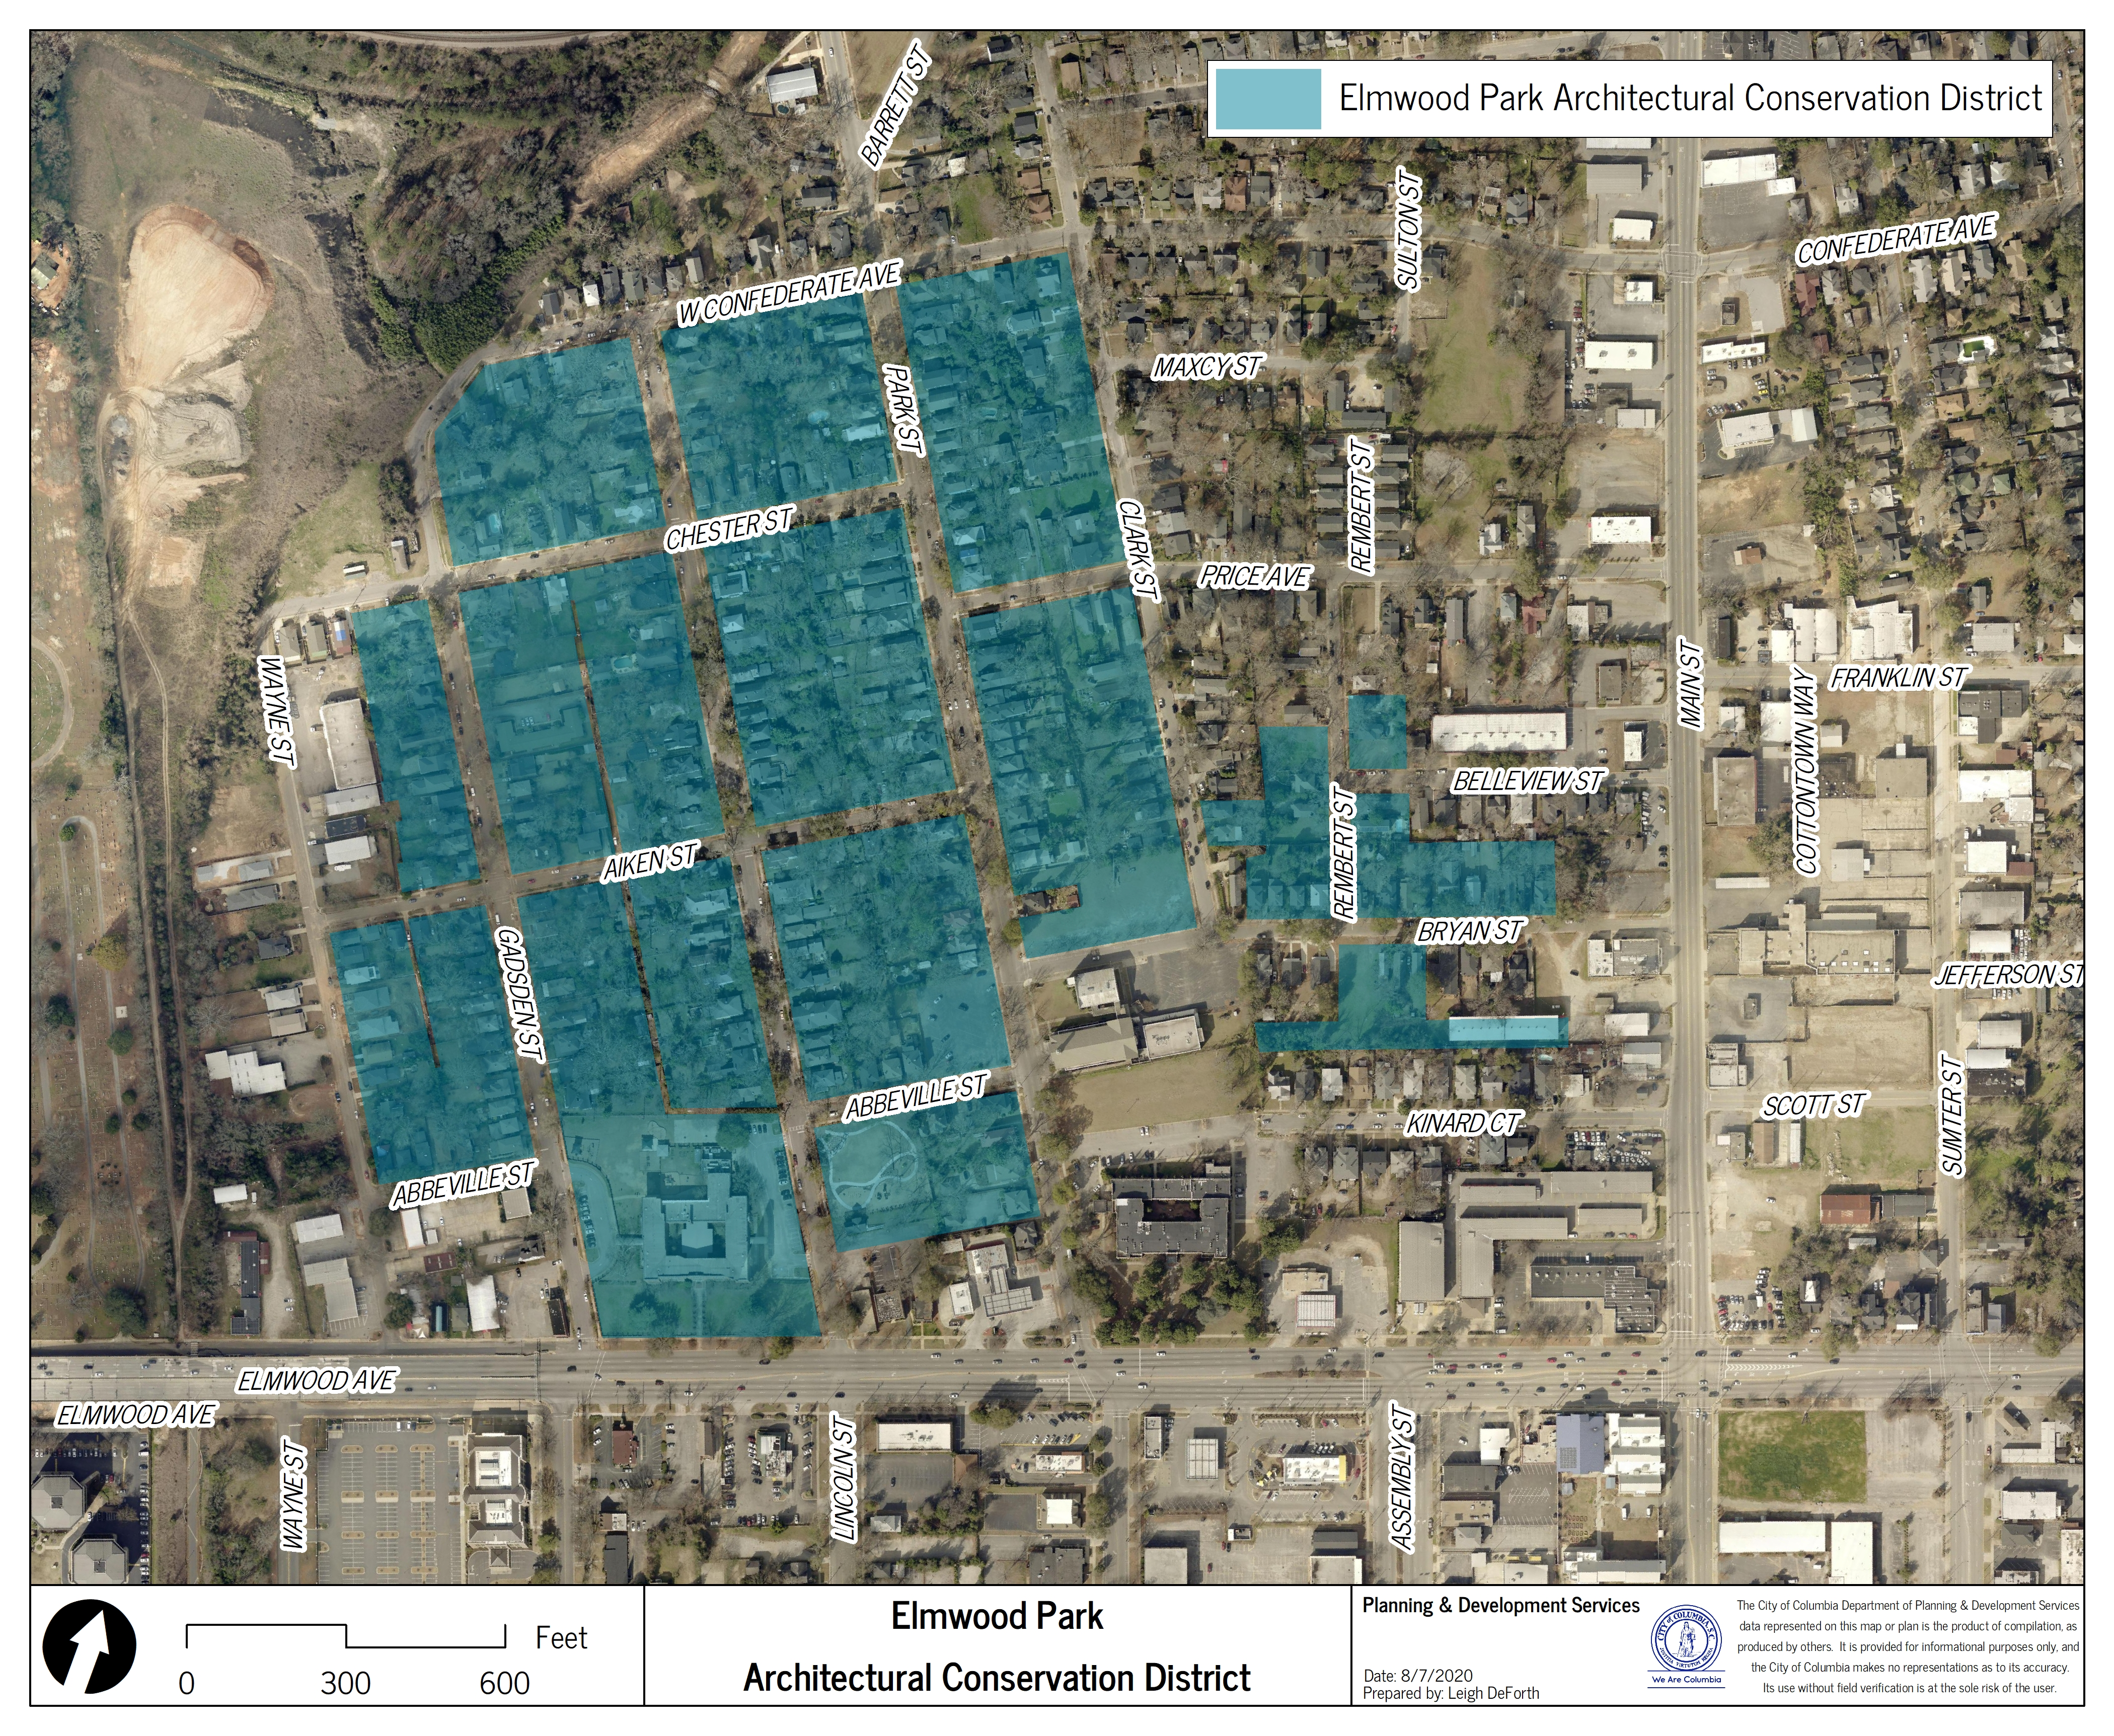 Map of Elmwood Park Architectural Conservation District